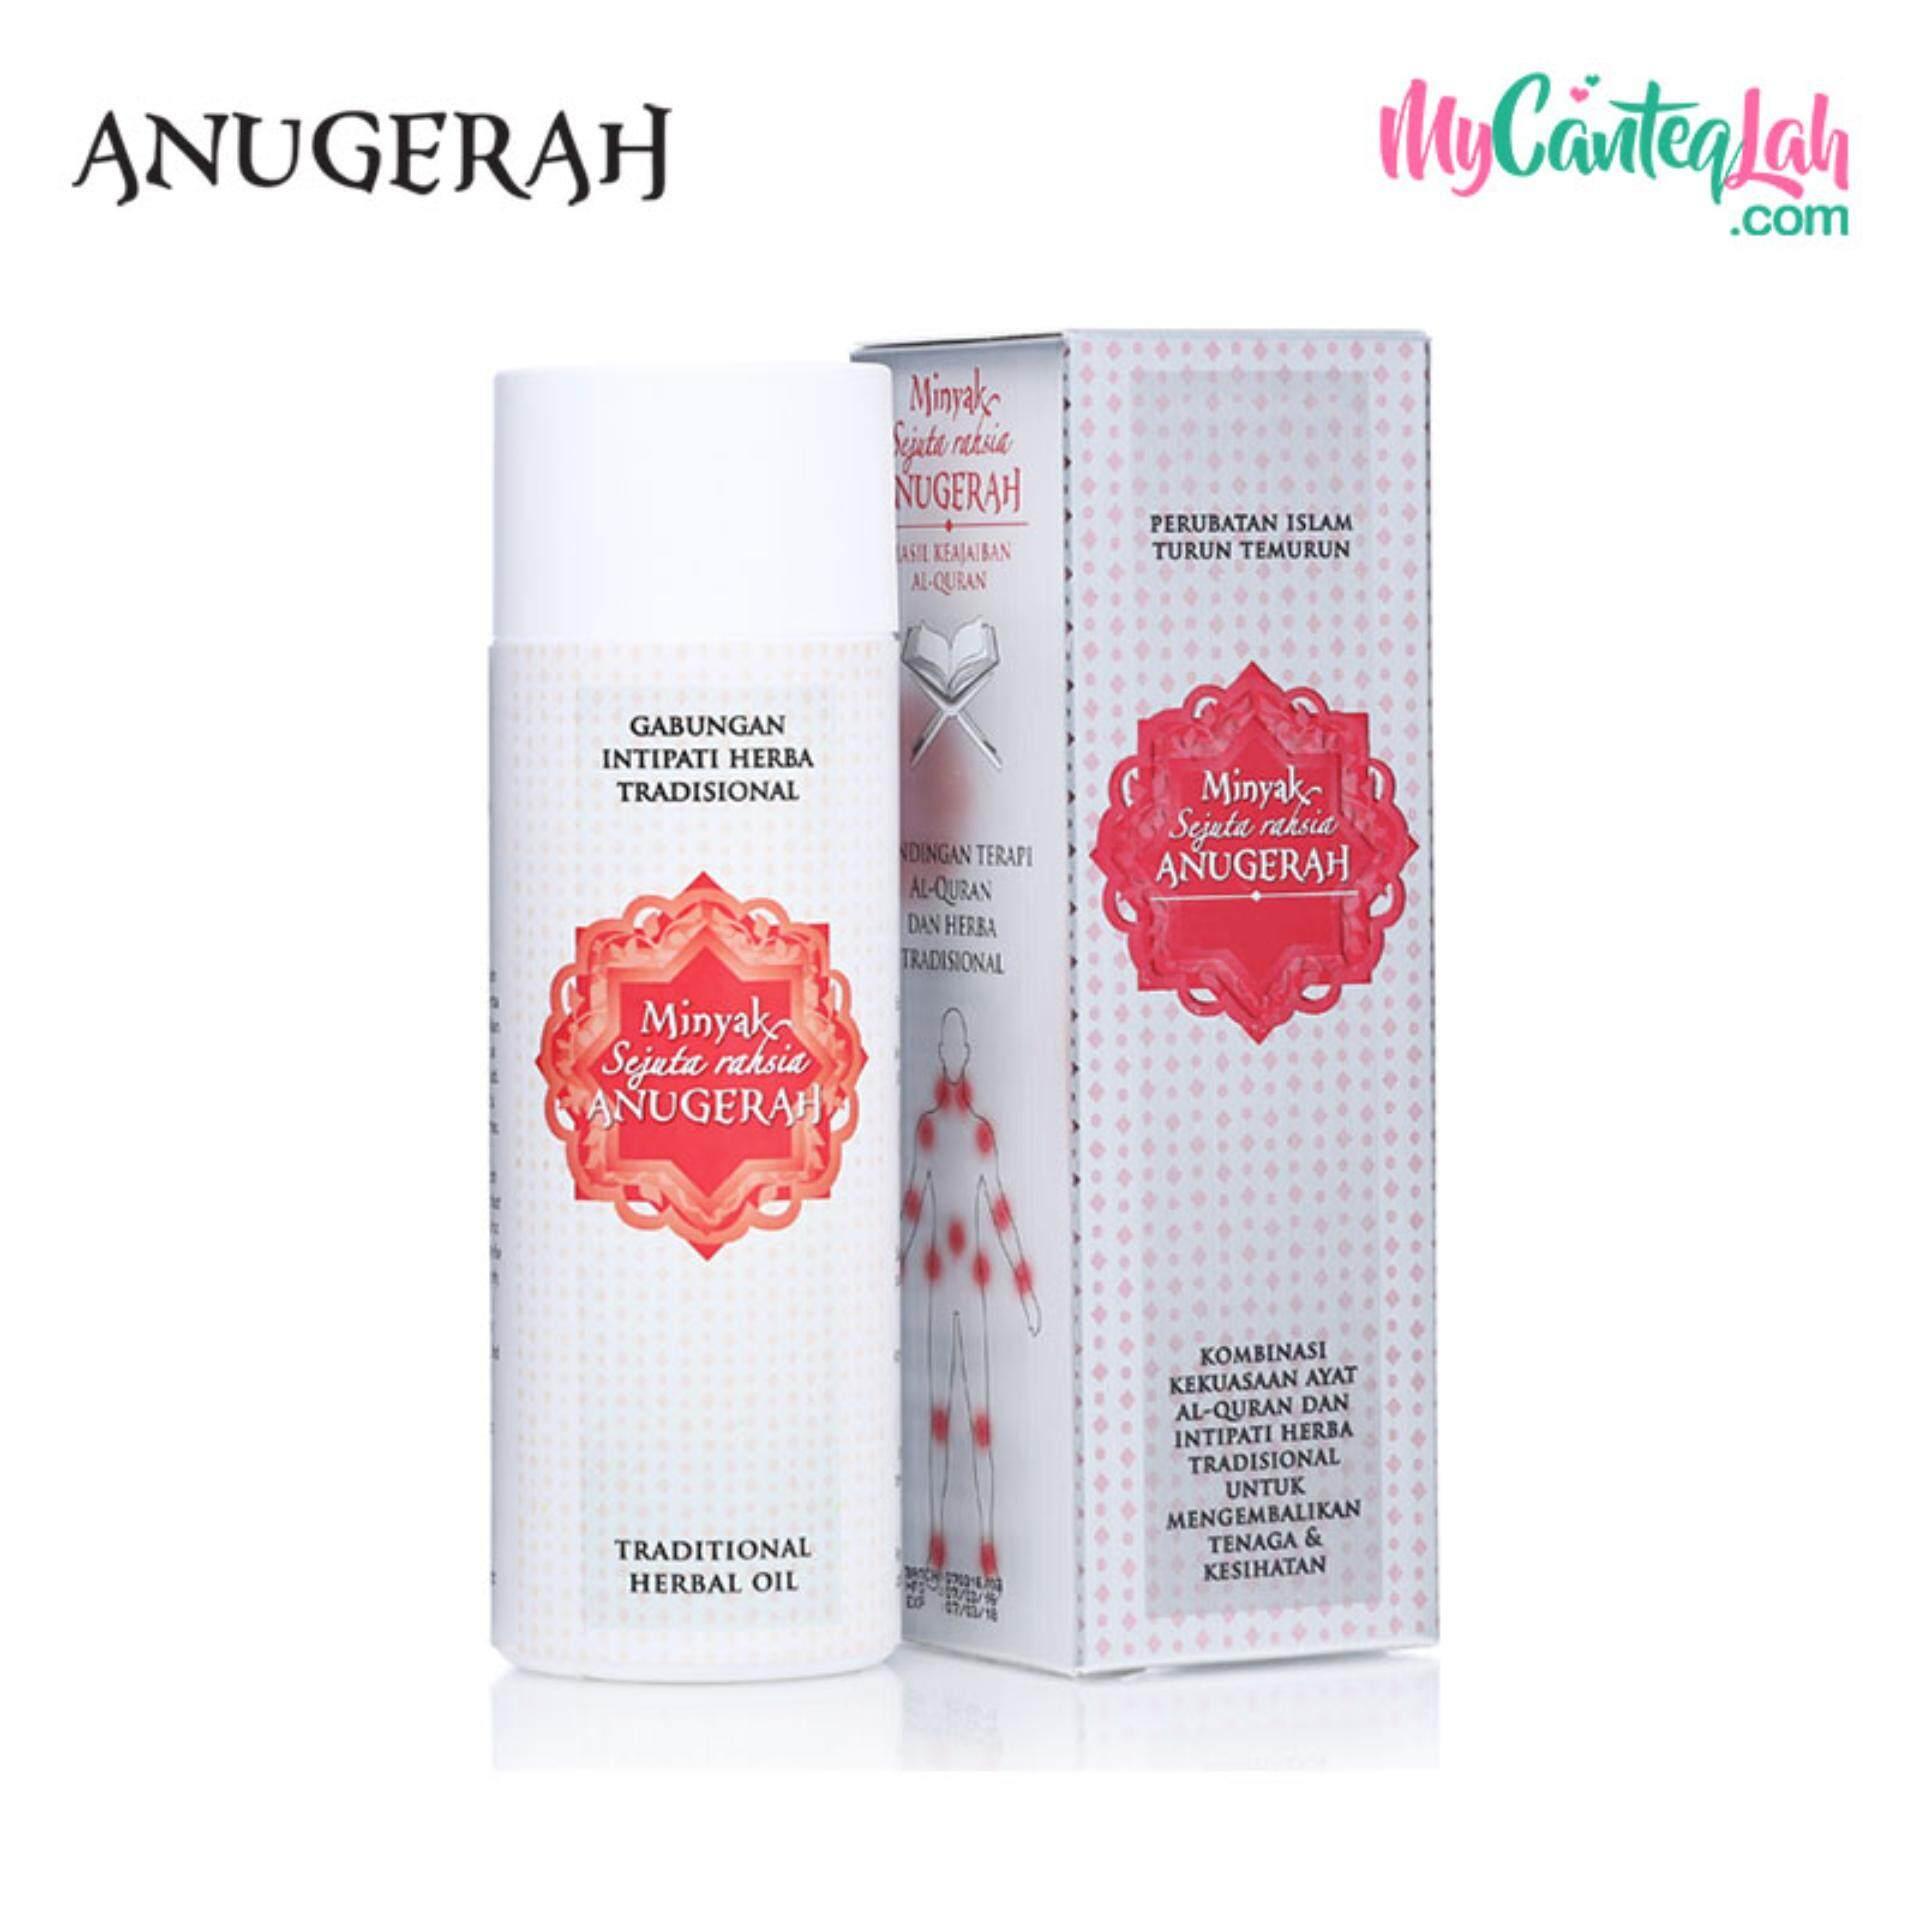 Ointments Creams Buy At Best Price In Freshcare Roll On Hot Minyak Angin 10 Ml 4 Botol Anugerah Sejuta Rahsia